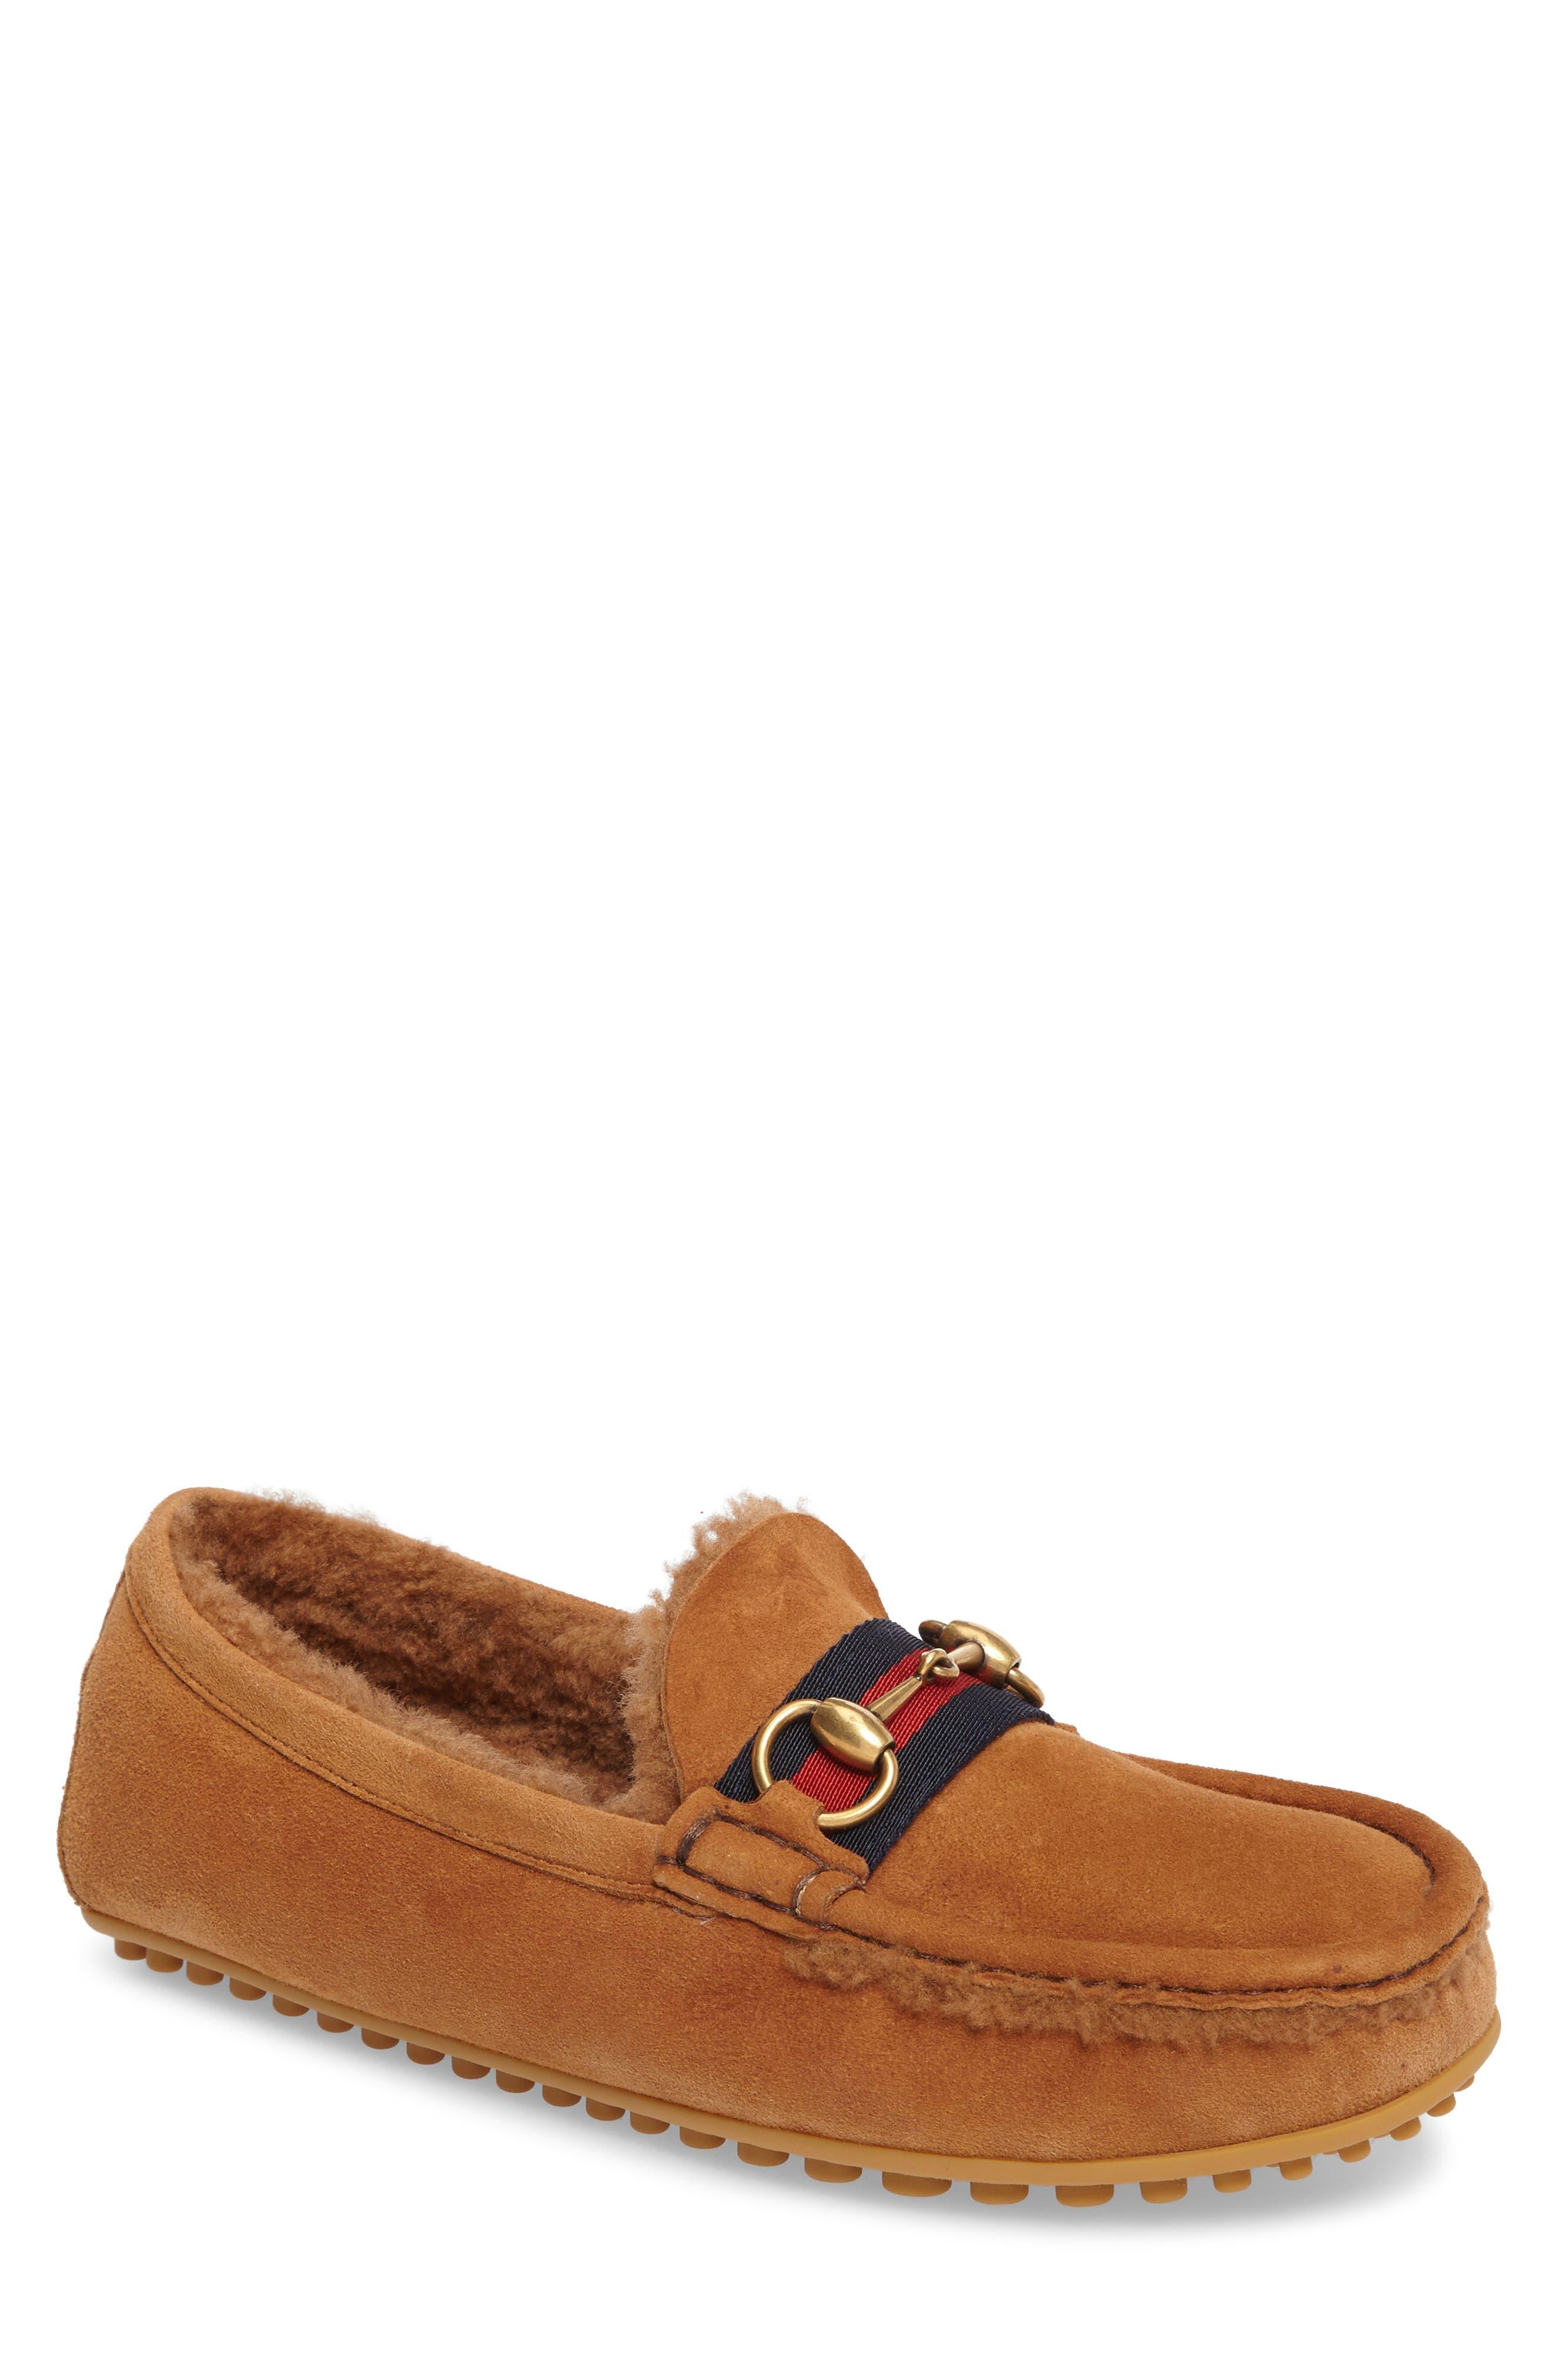 Driving Shoe with Genuine Shearling,                             Main thumbnail 1, color,                             Dark Tan